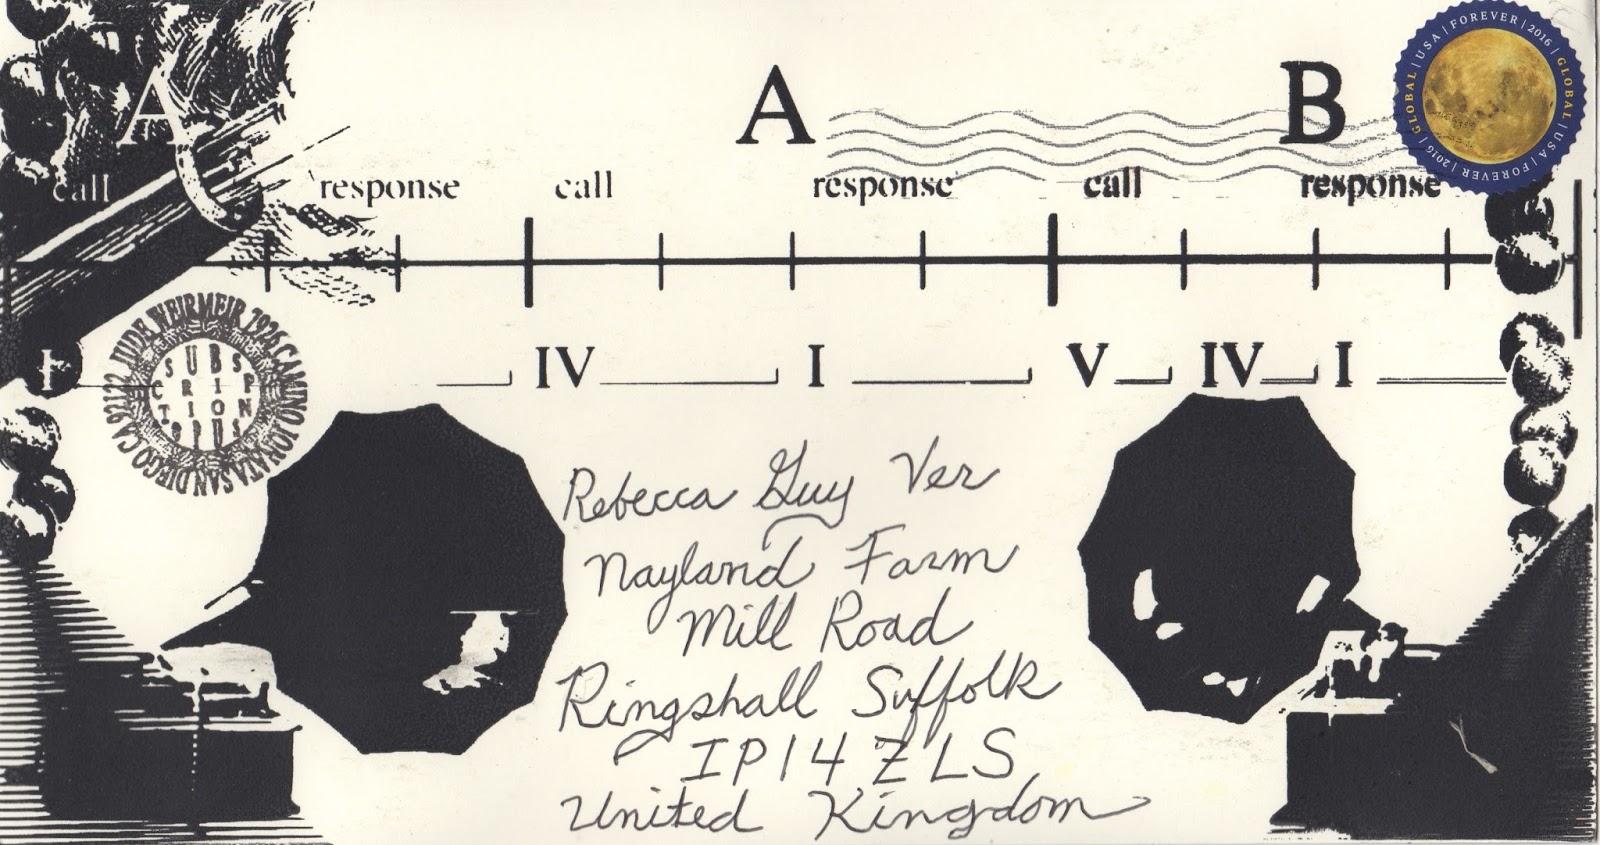 The Postal Ledger: Meet me at Dan Lynch or La Jolla